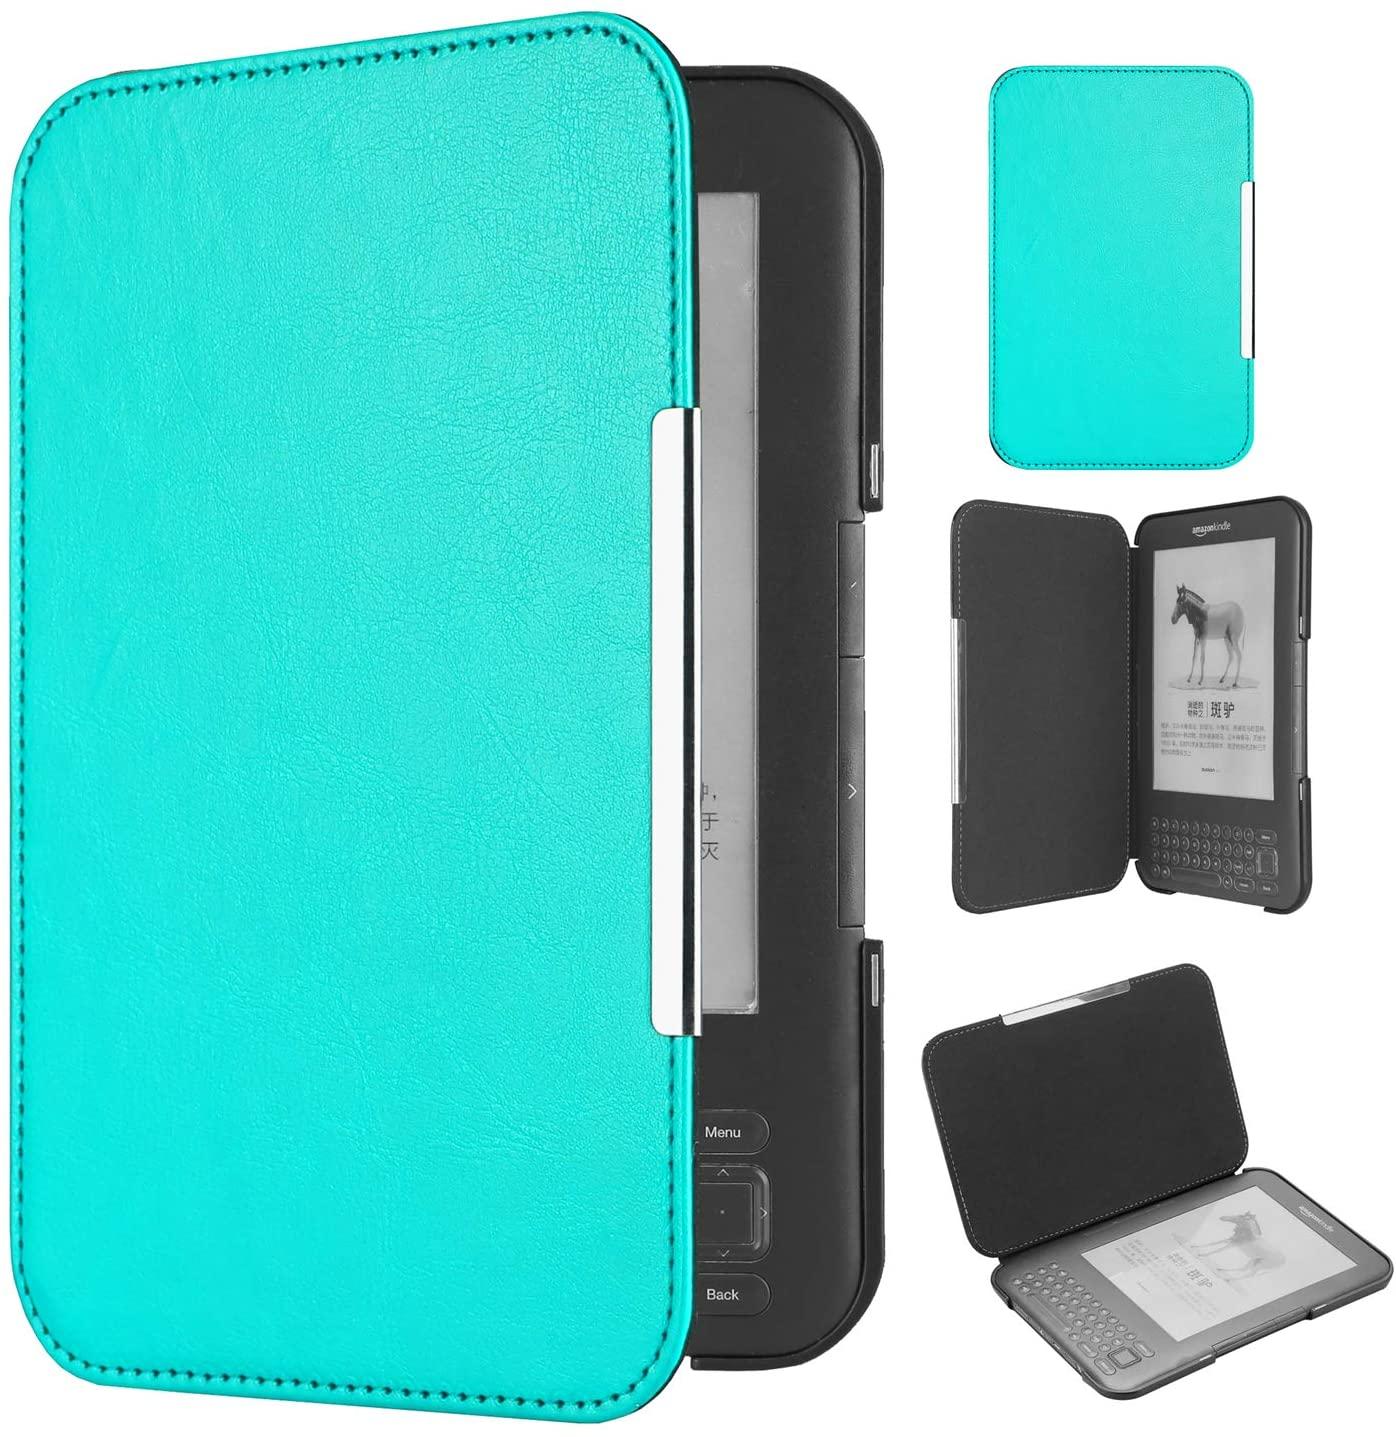 Huasiru PU Leather Case for Kindle 3rd Gen (Keyboard Version), Light Blue